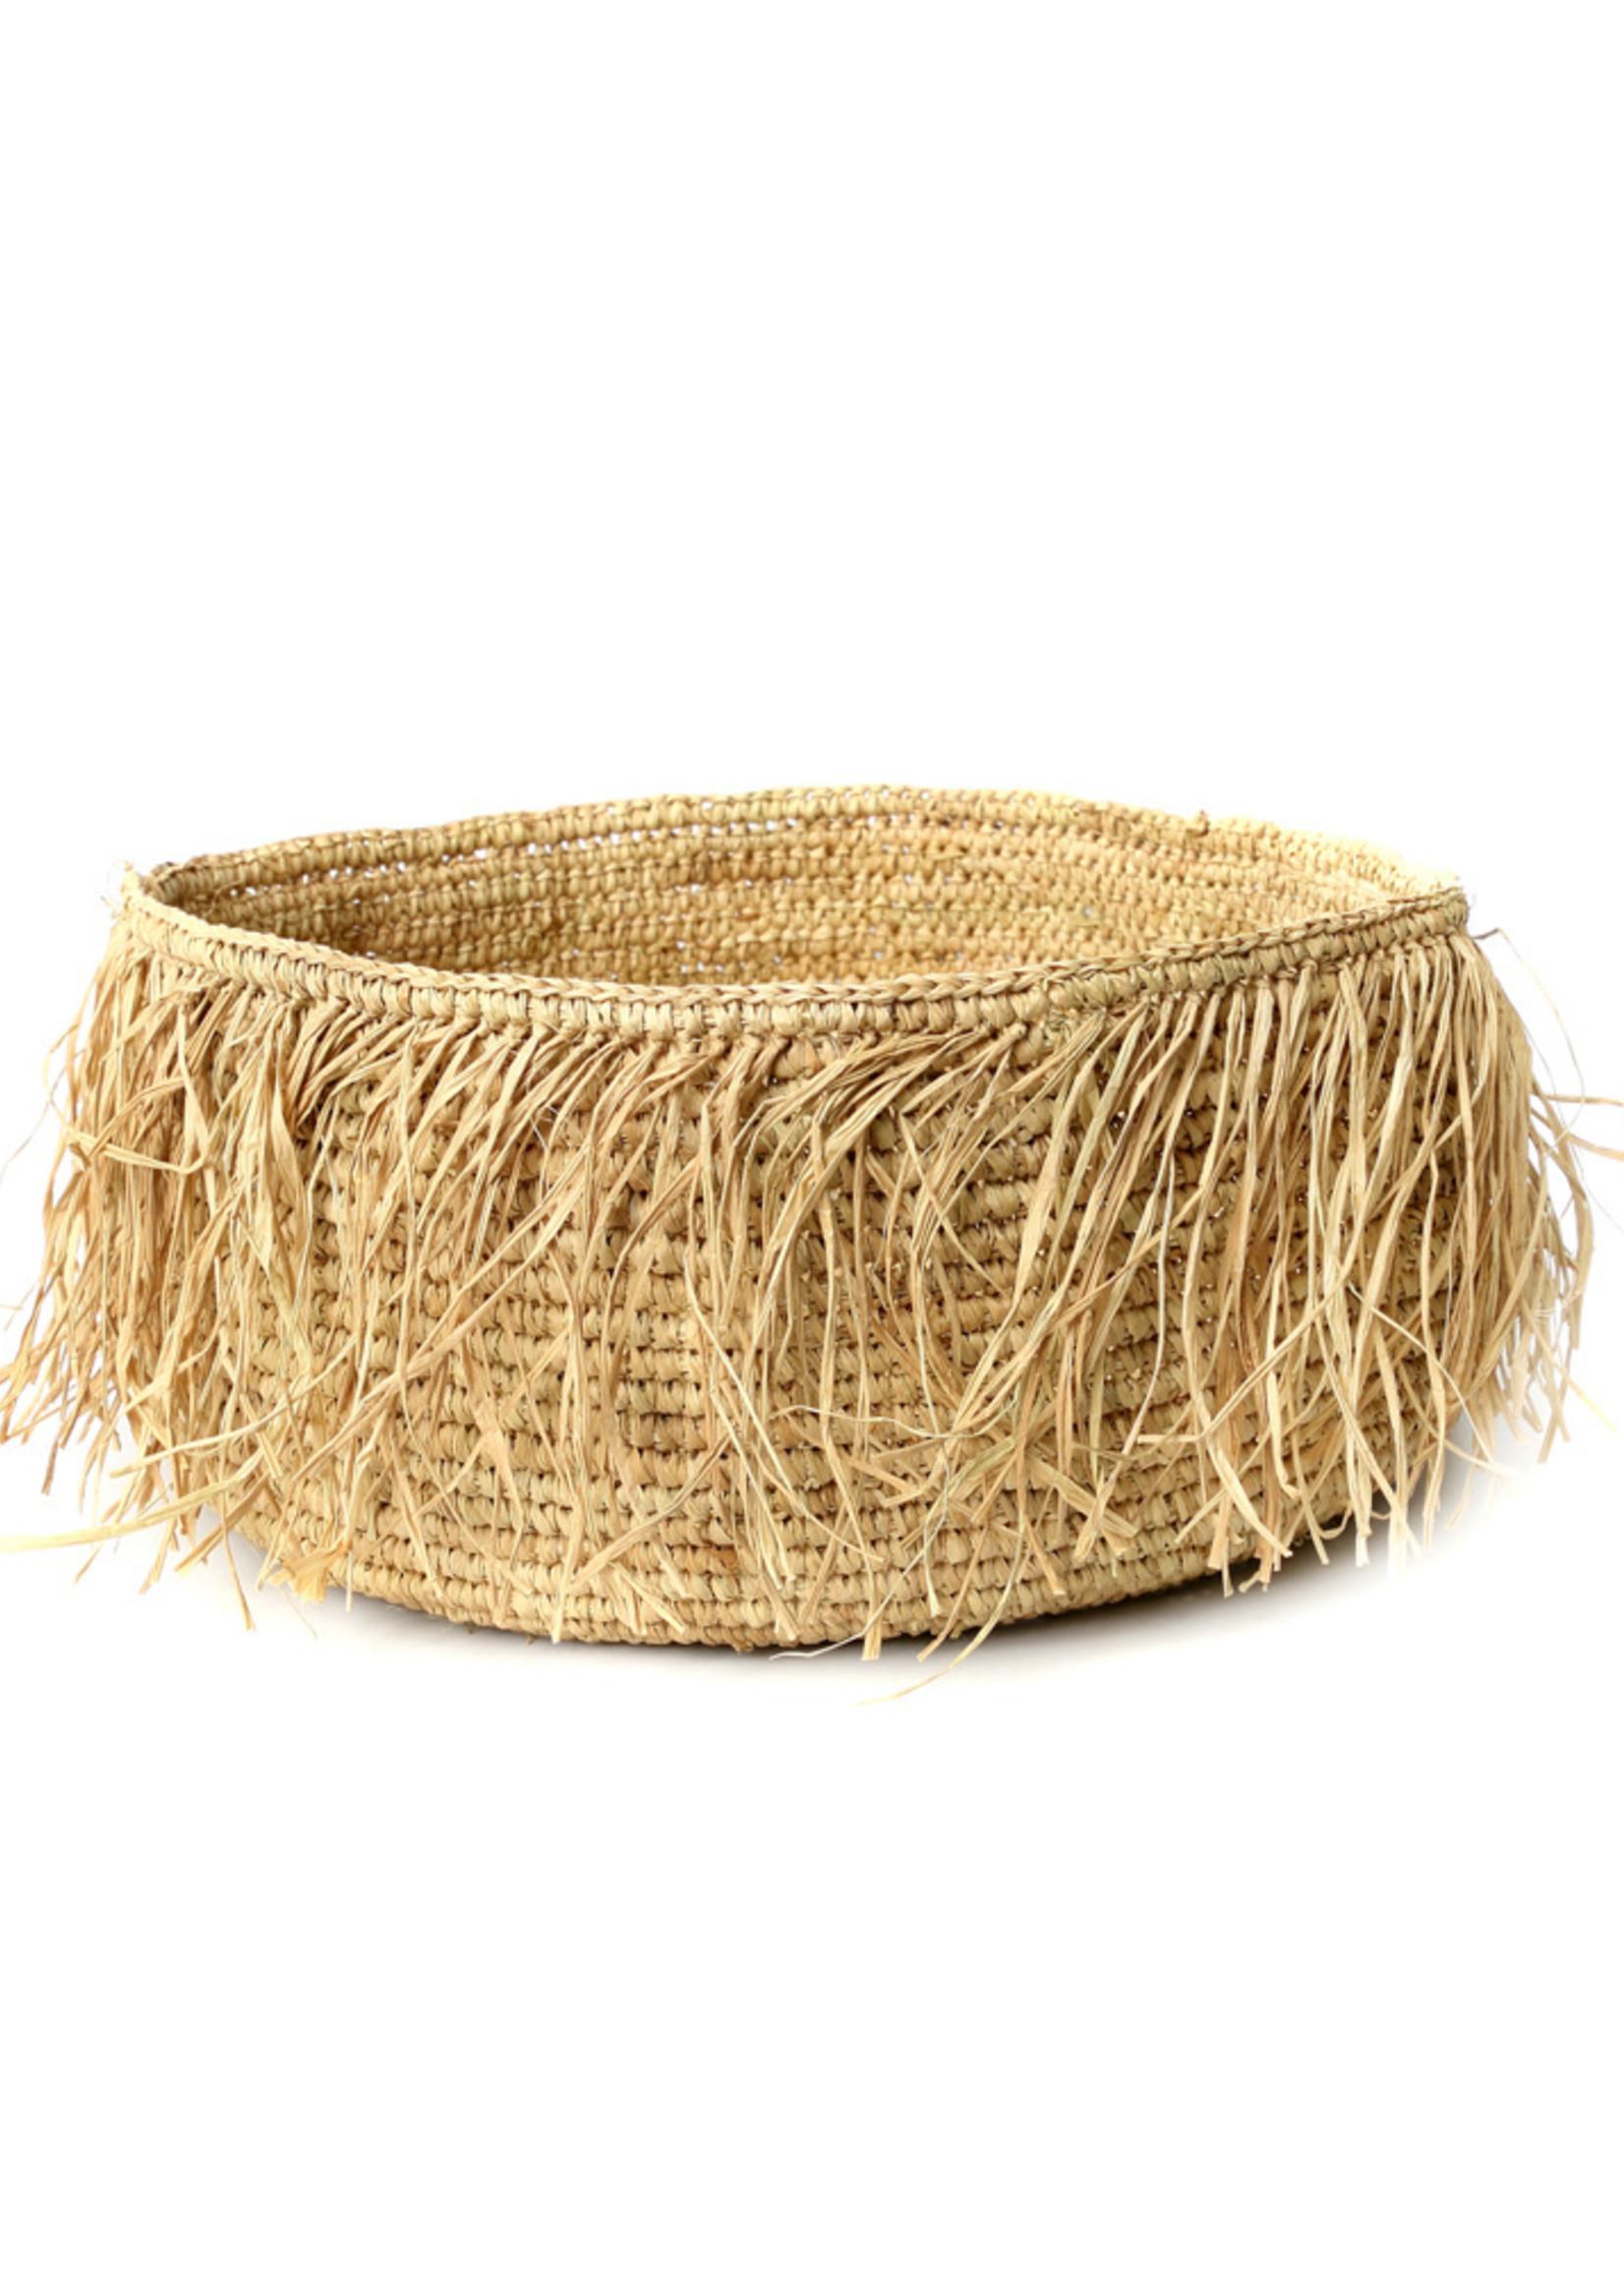 The Raffia Bowl - Natural - S